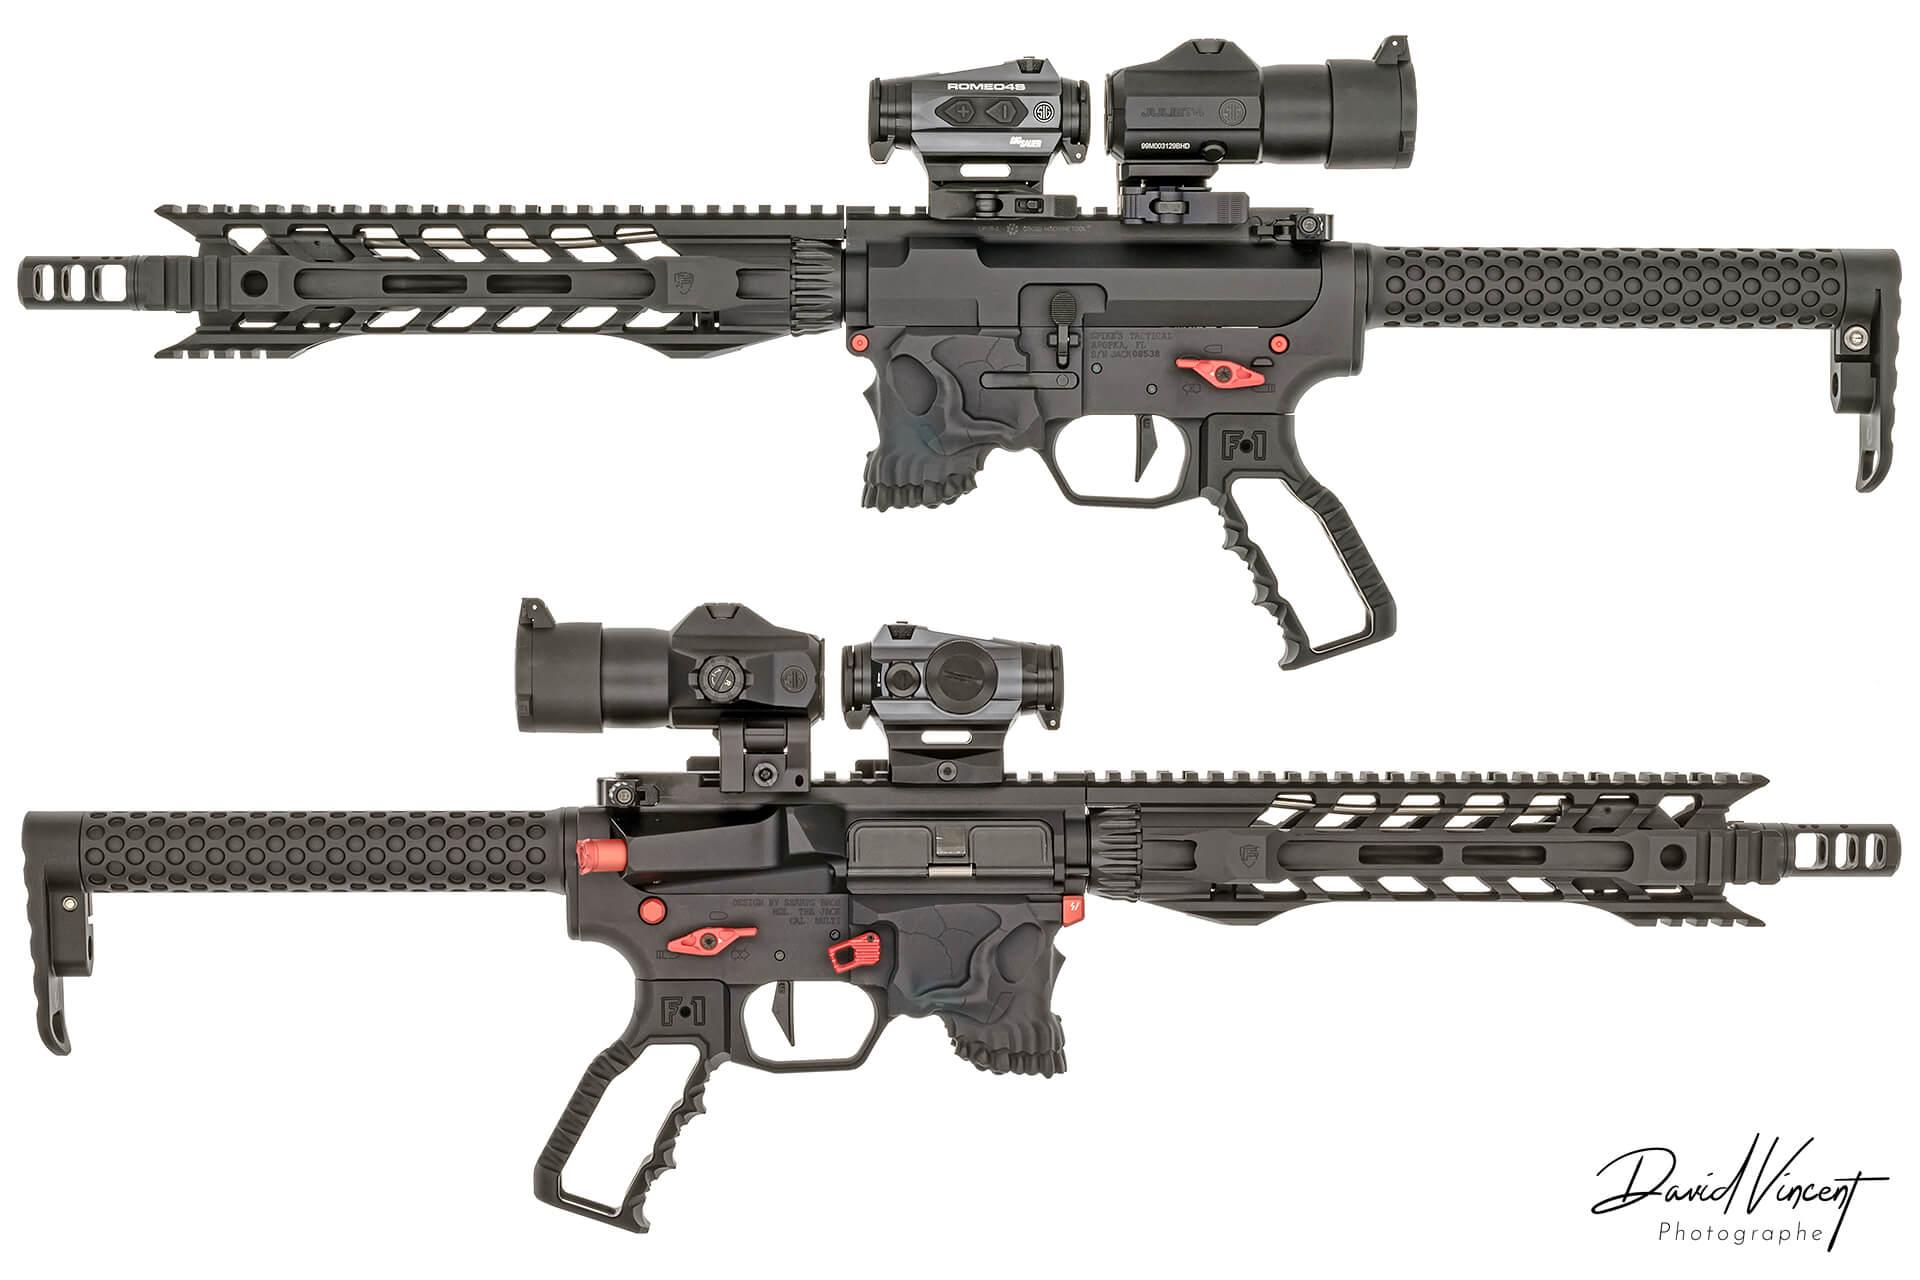 Spike AR15 custom - Photographe d'armes à feu